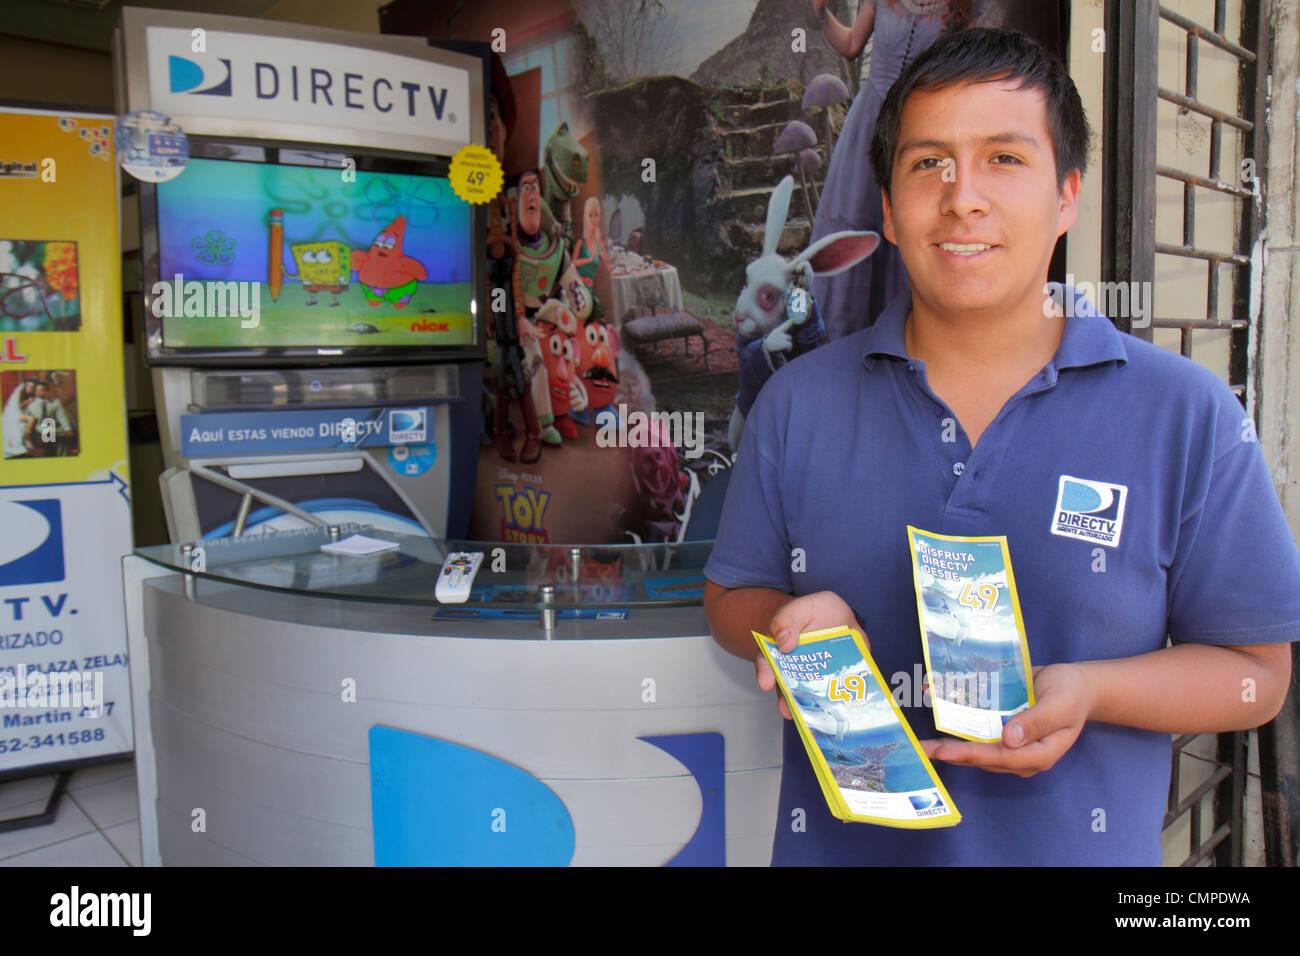 Peru, Tacna, Calle San Martin, DIRECTV, Direct TV, satellites television provider, technology, company, Hispanic Stock Photo